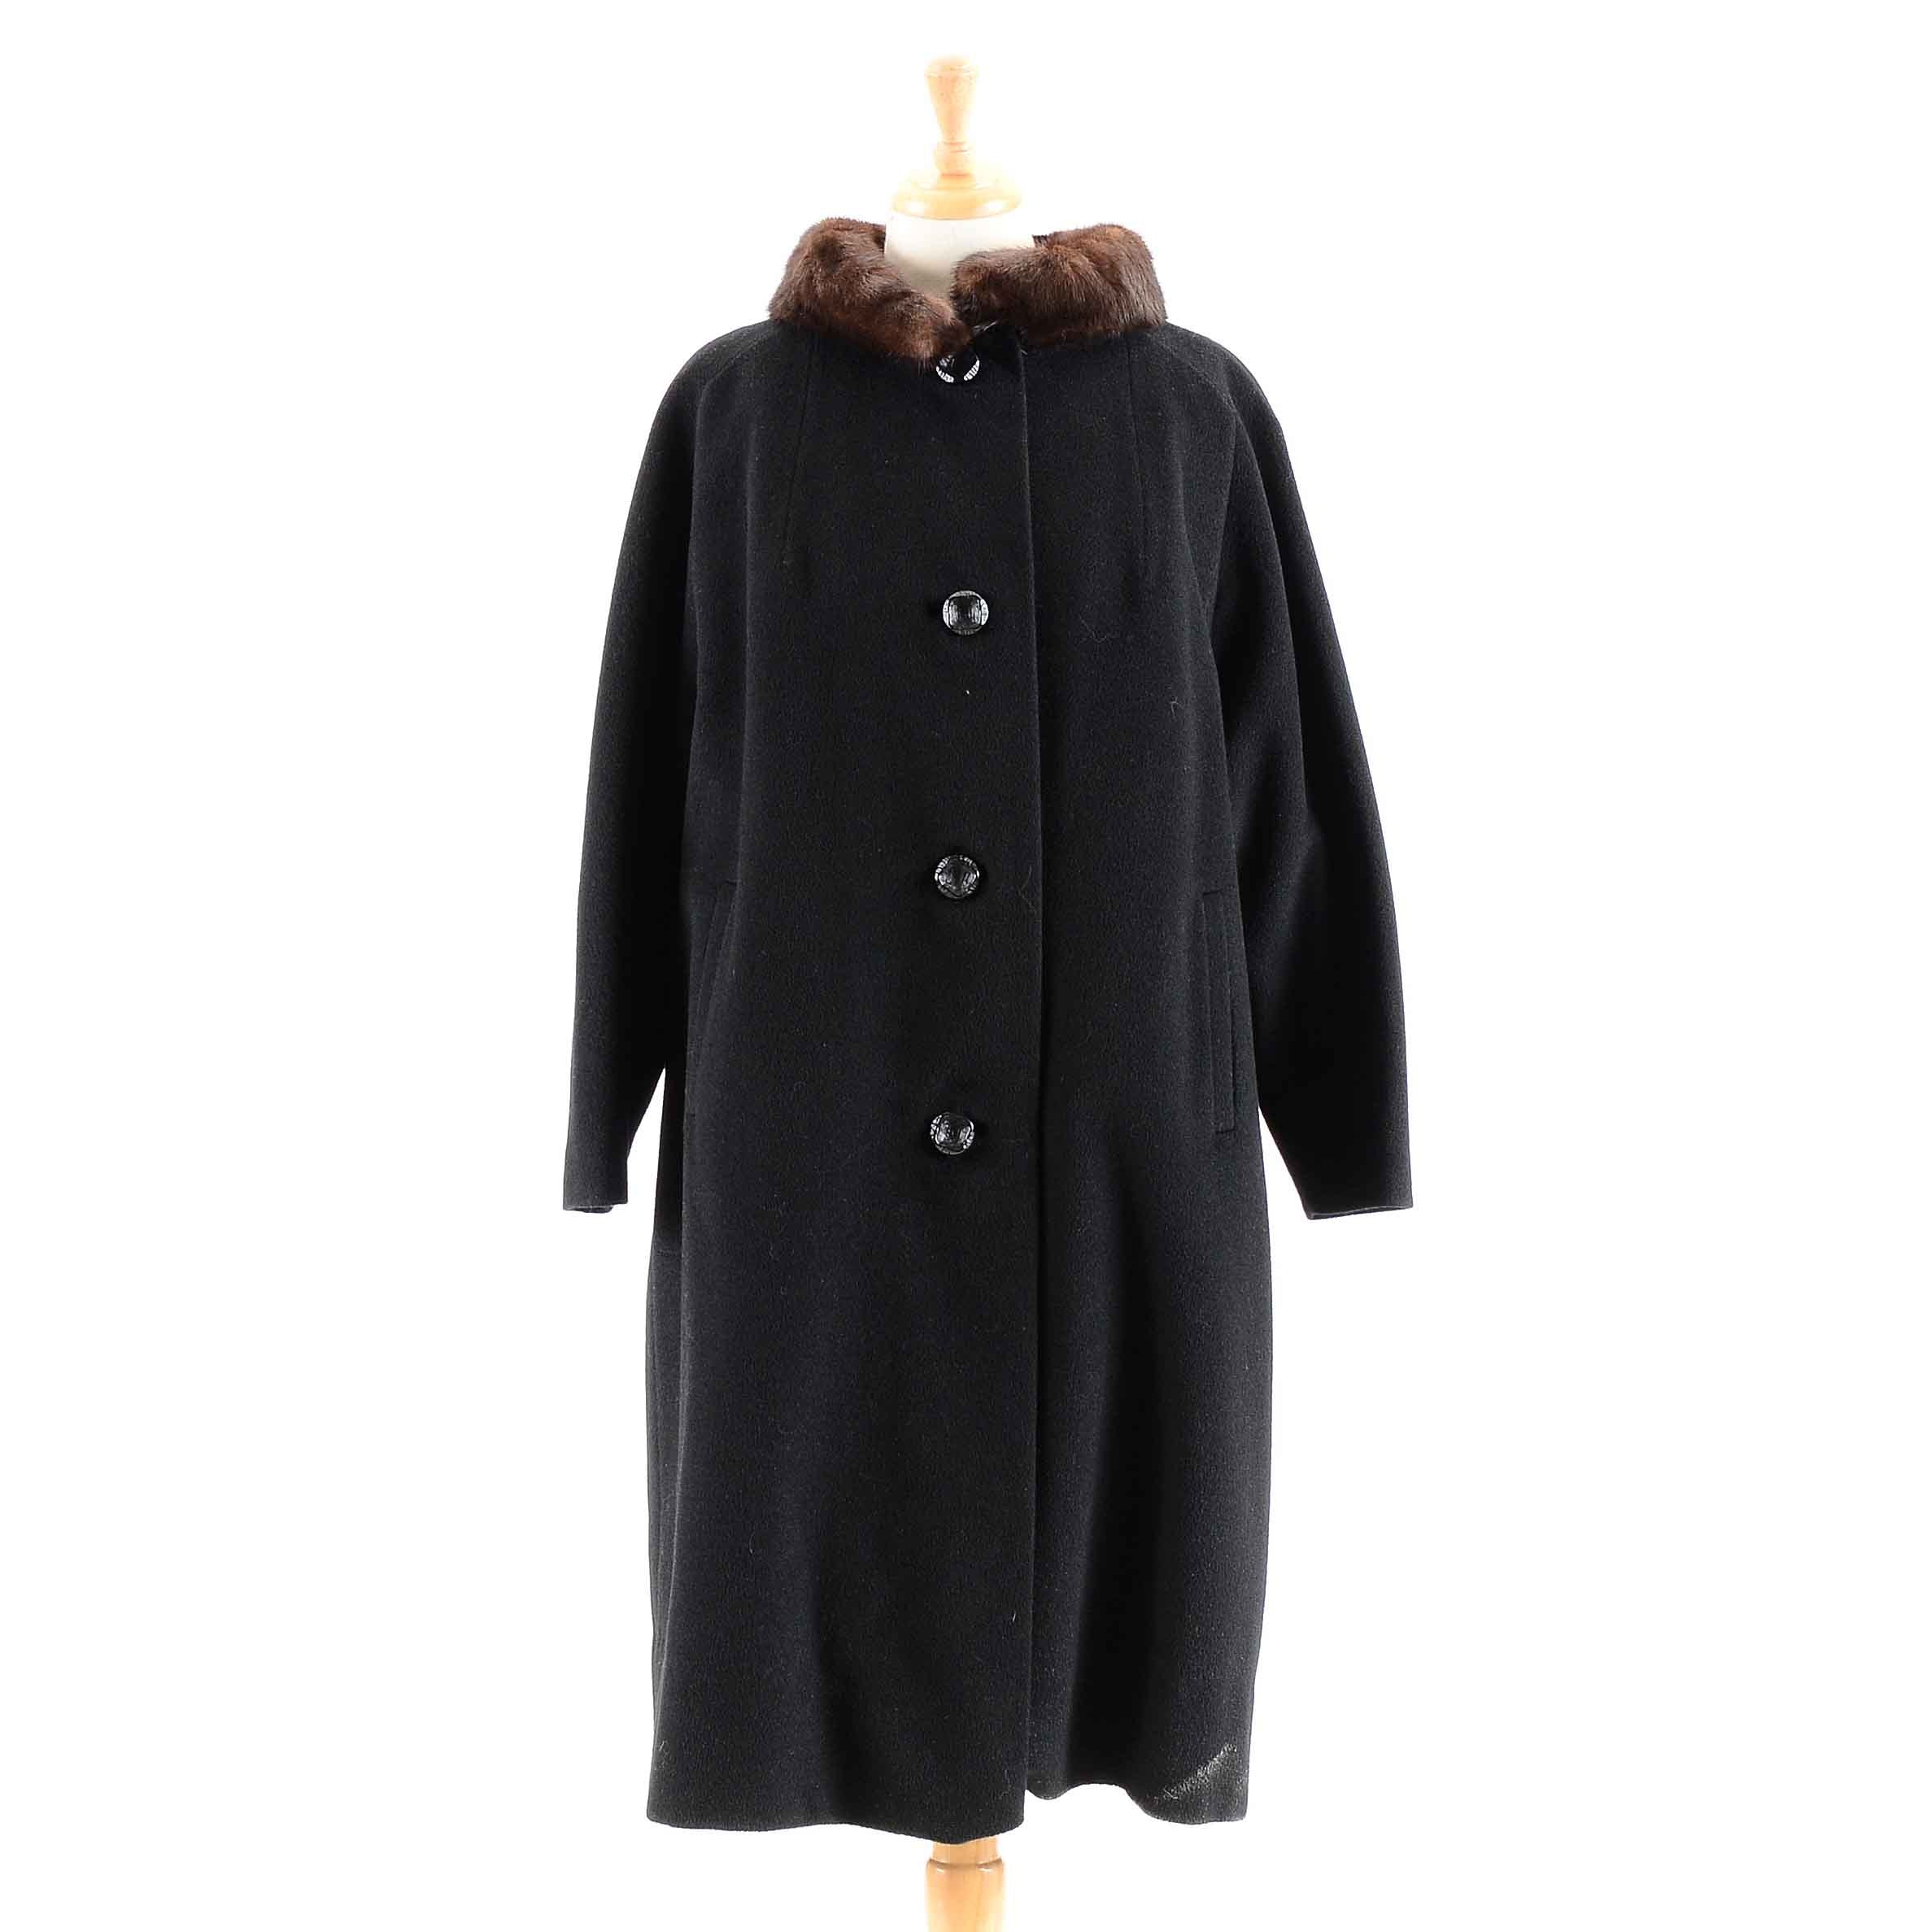 Vintage Women's Cashmere and Mink Fur Coat